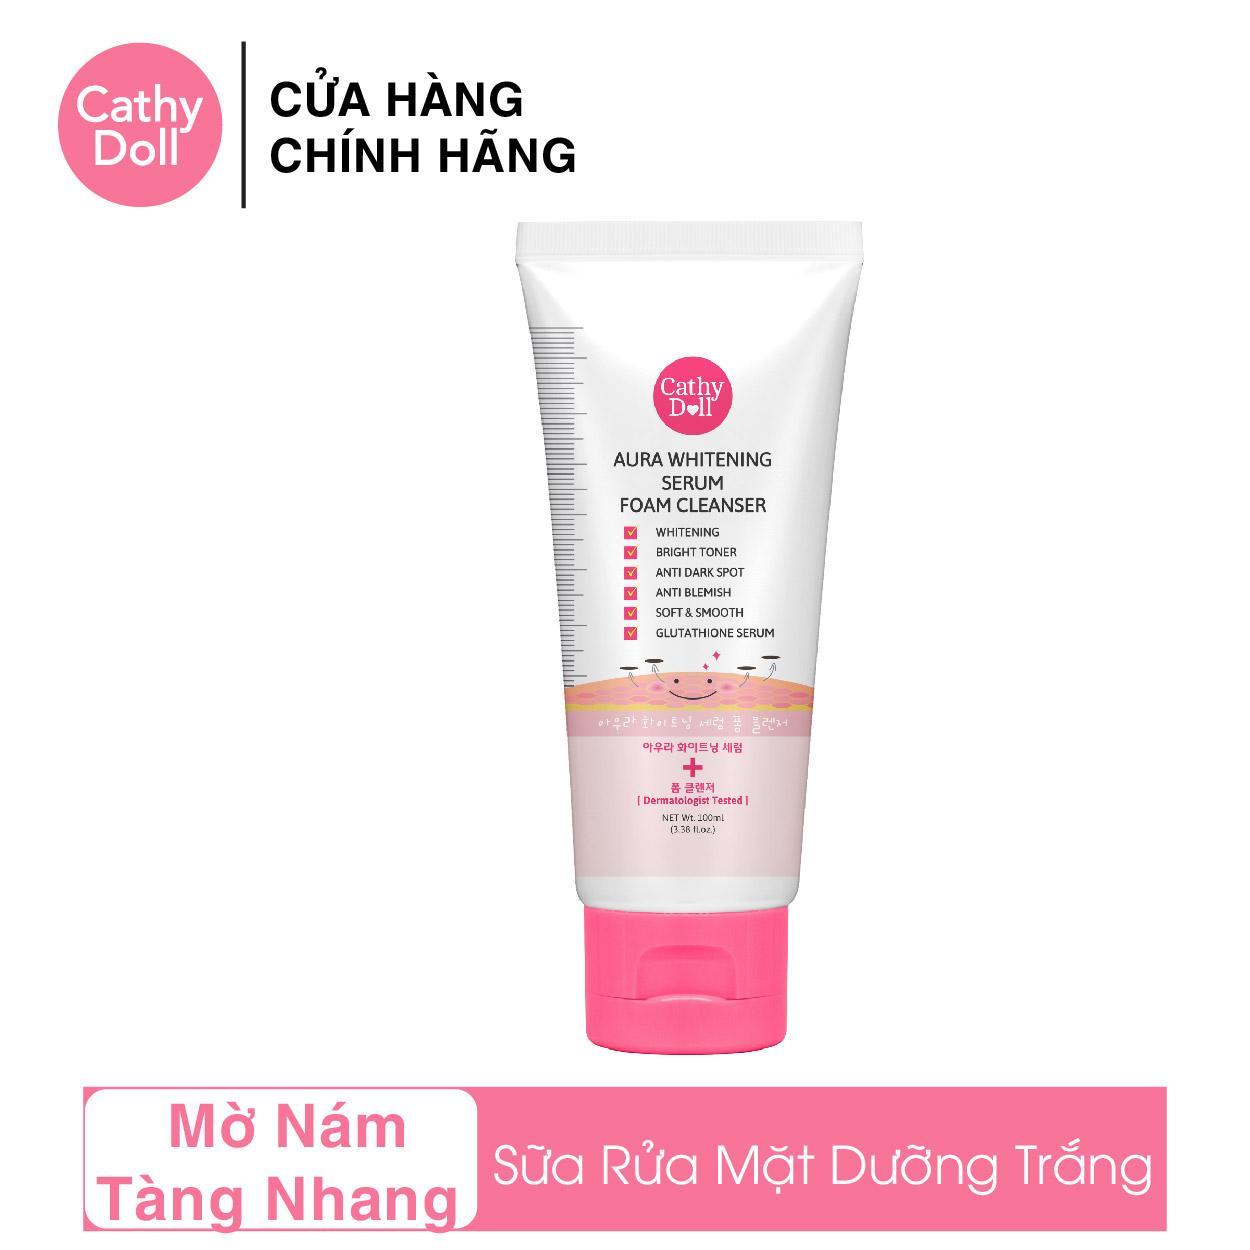 Sữa Rửa Mặt Dưỡng Trắng Cathy Doll Aura Whitening Serum Foam Cleanser 100ml tốt nhất